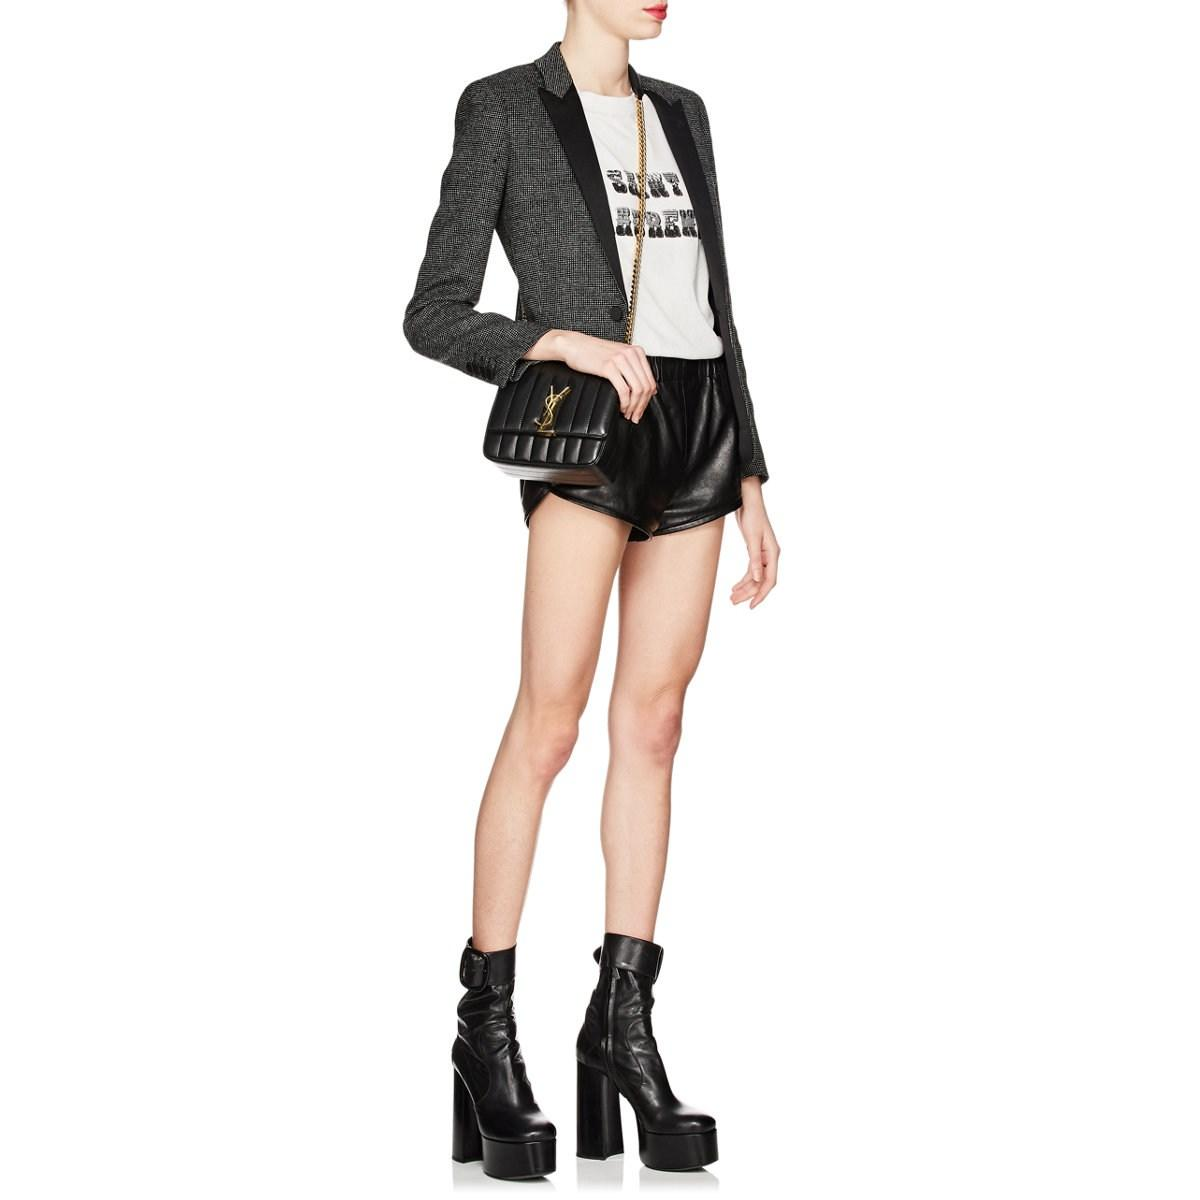 63beb1fcb64 Saint Laurent - Black Monogram Vicky Small Leather Chain Bag - Lyst. View  fullscreen